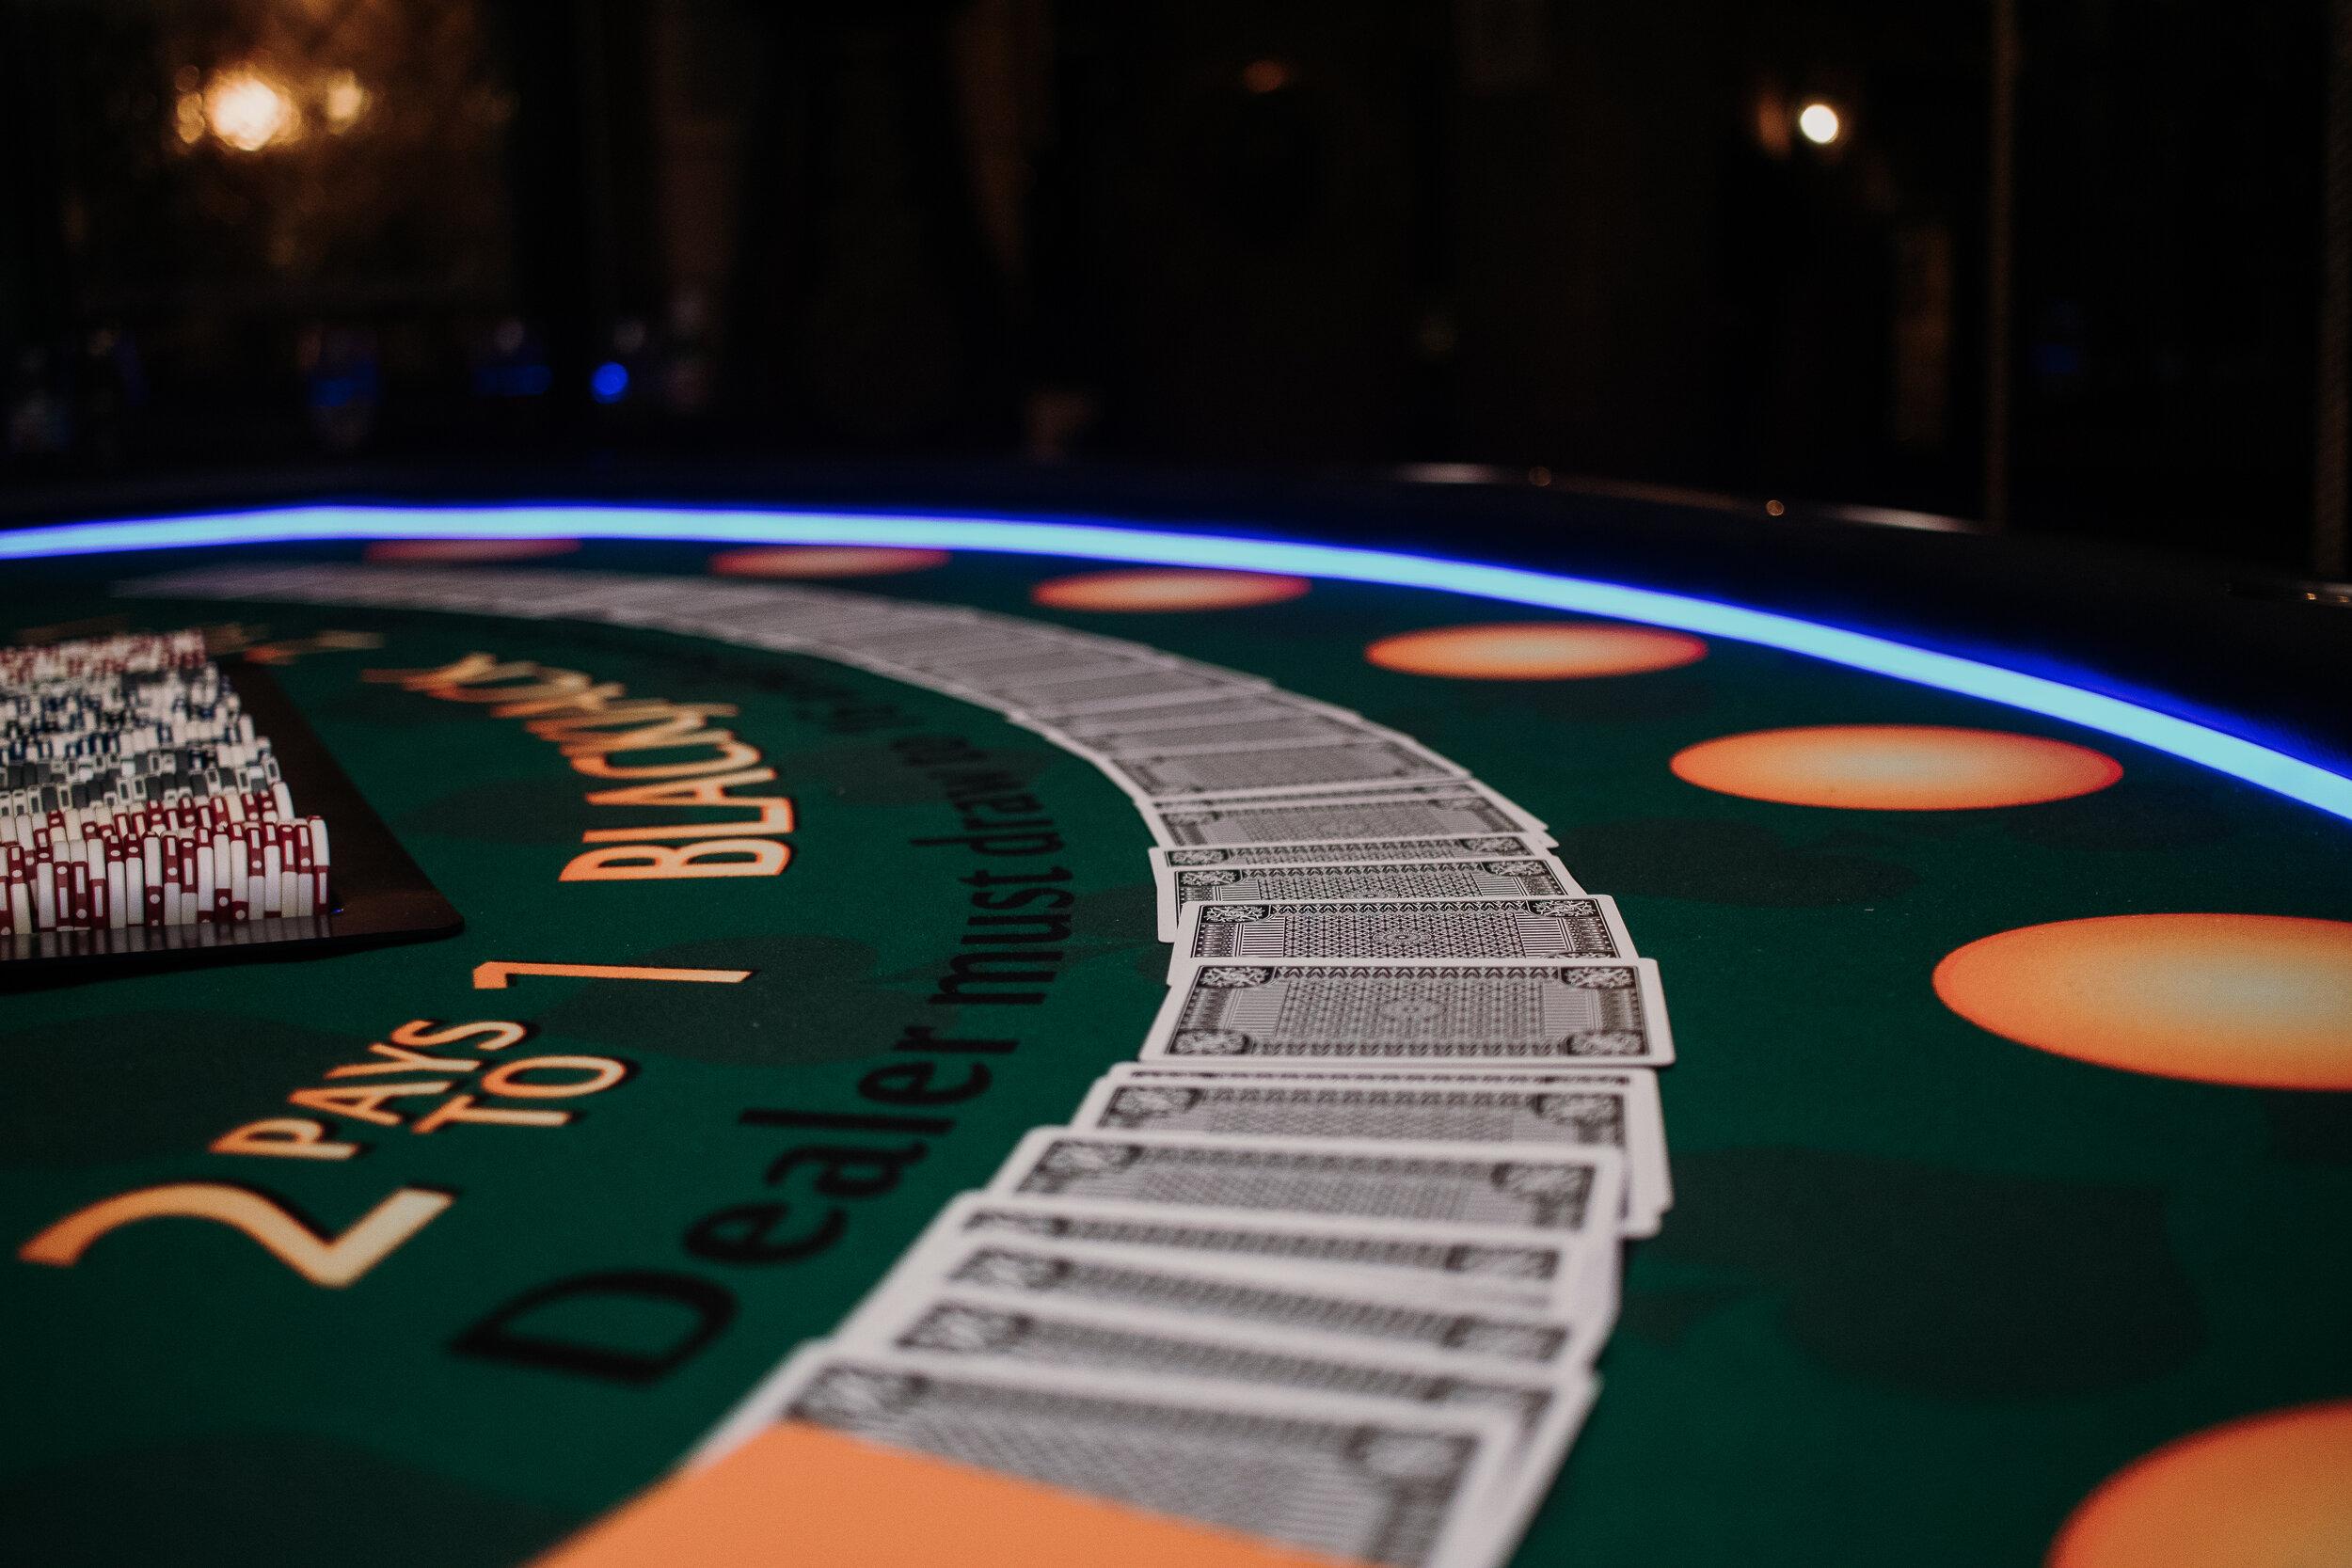 LED blackjack table.jpg